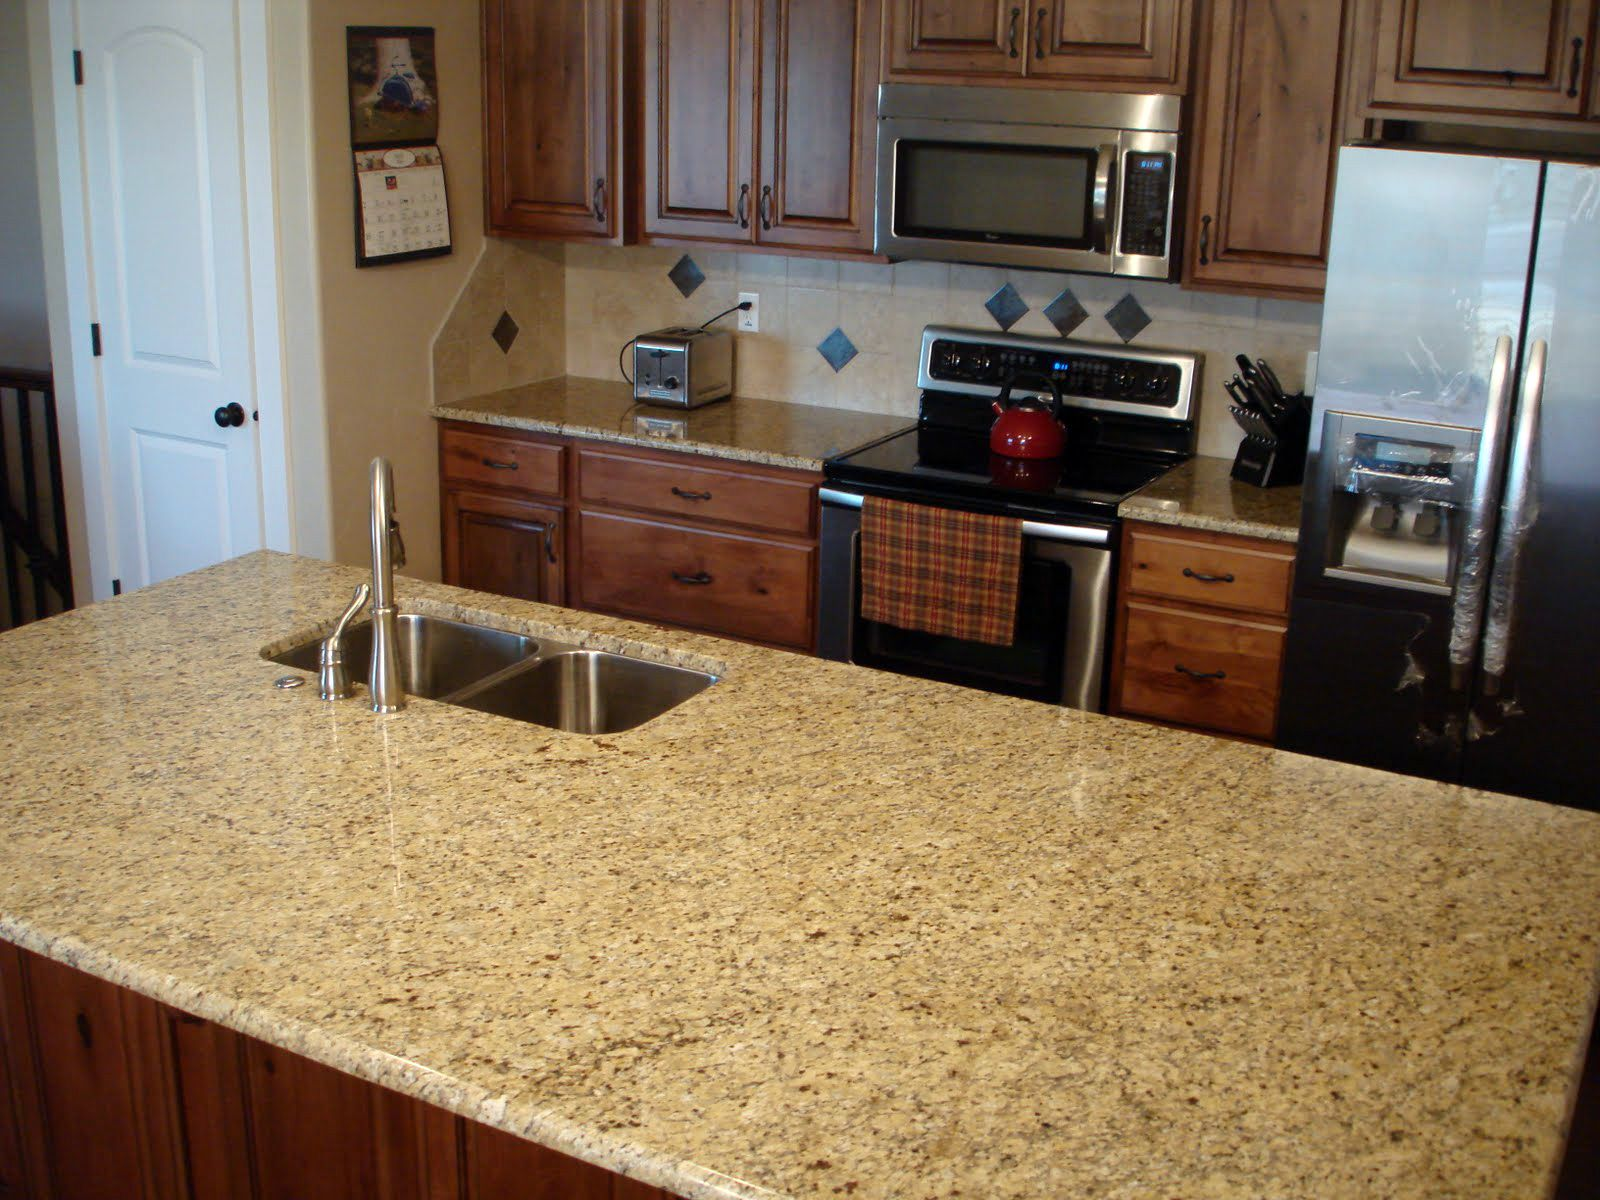 Granit Kitchen Giallo Ornamental Granite Kitchen Countertop The Granite We